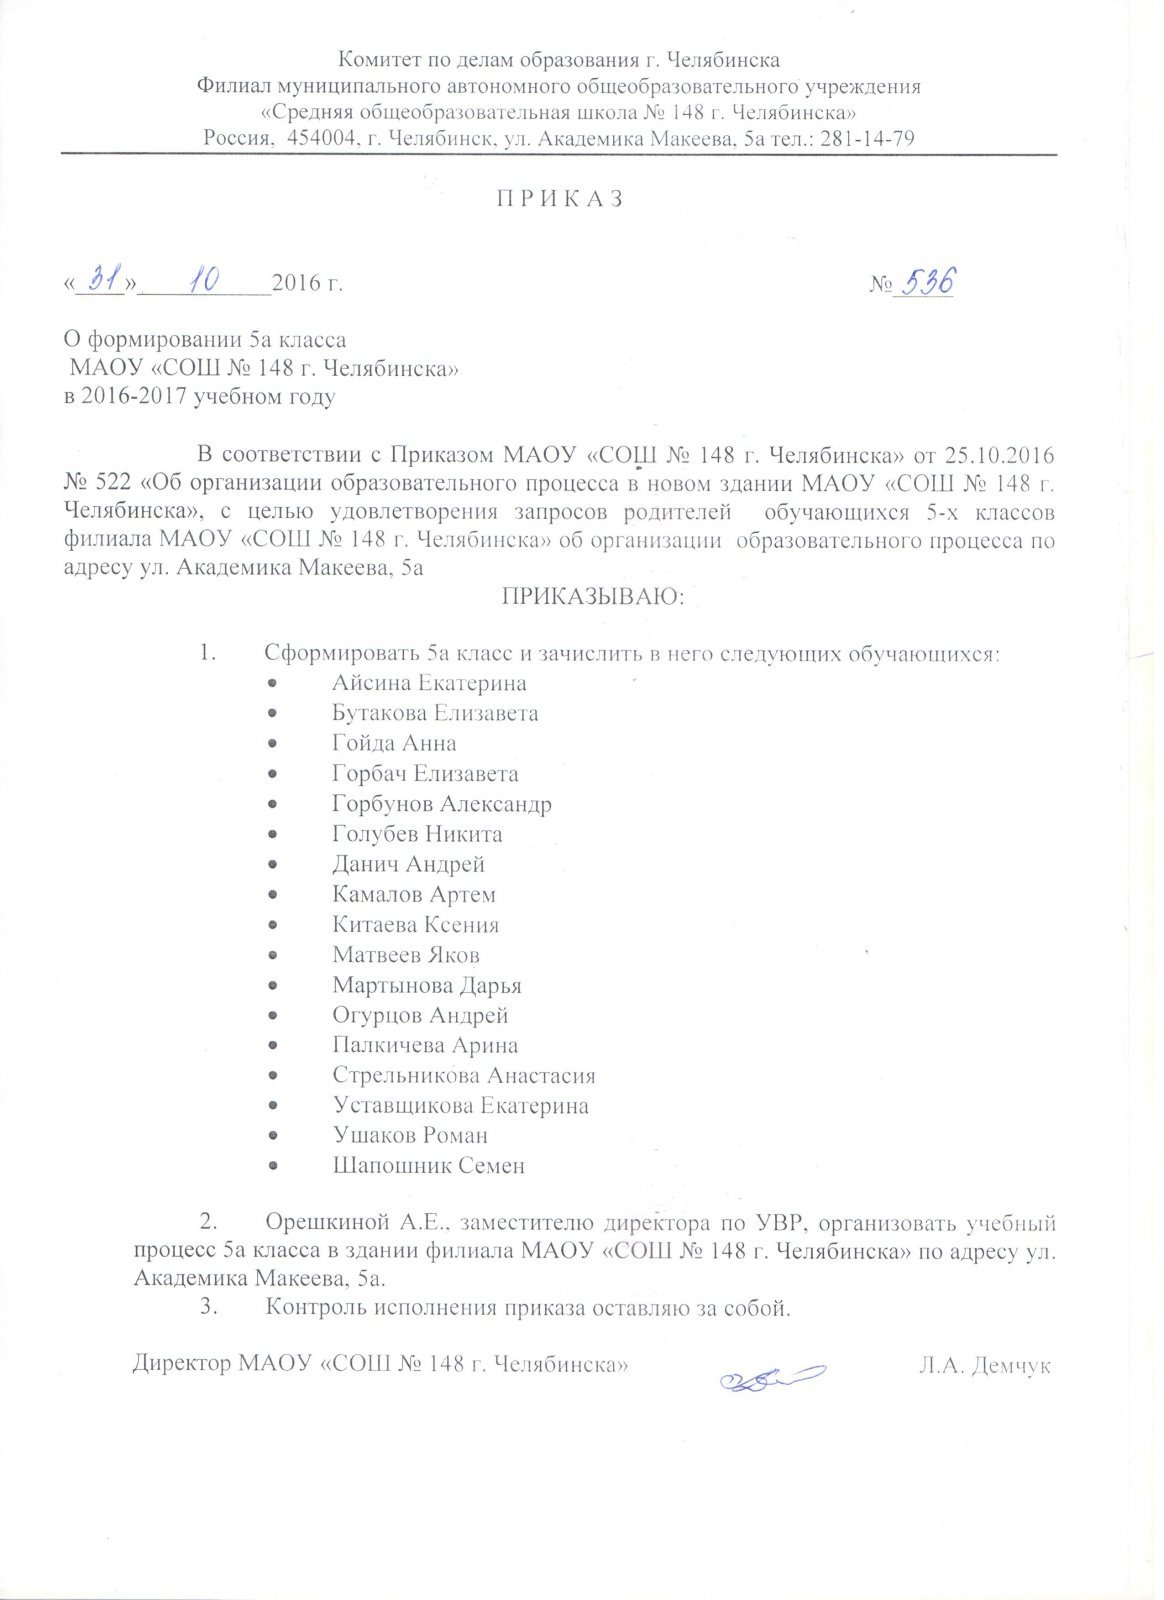 prikaz-formir-5a-kl